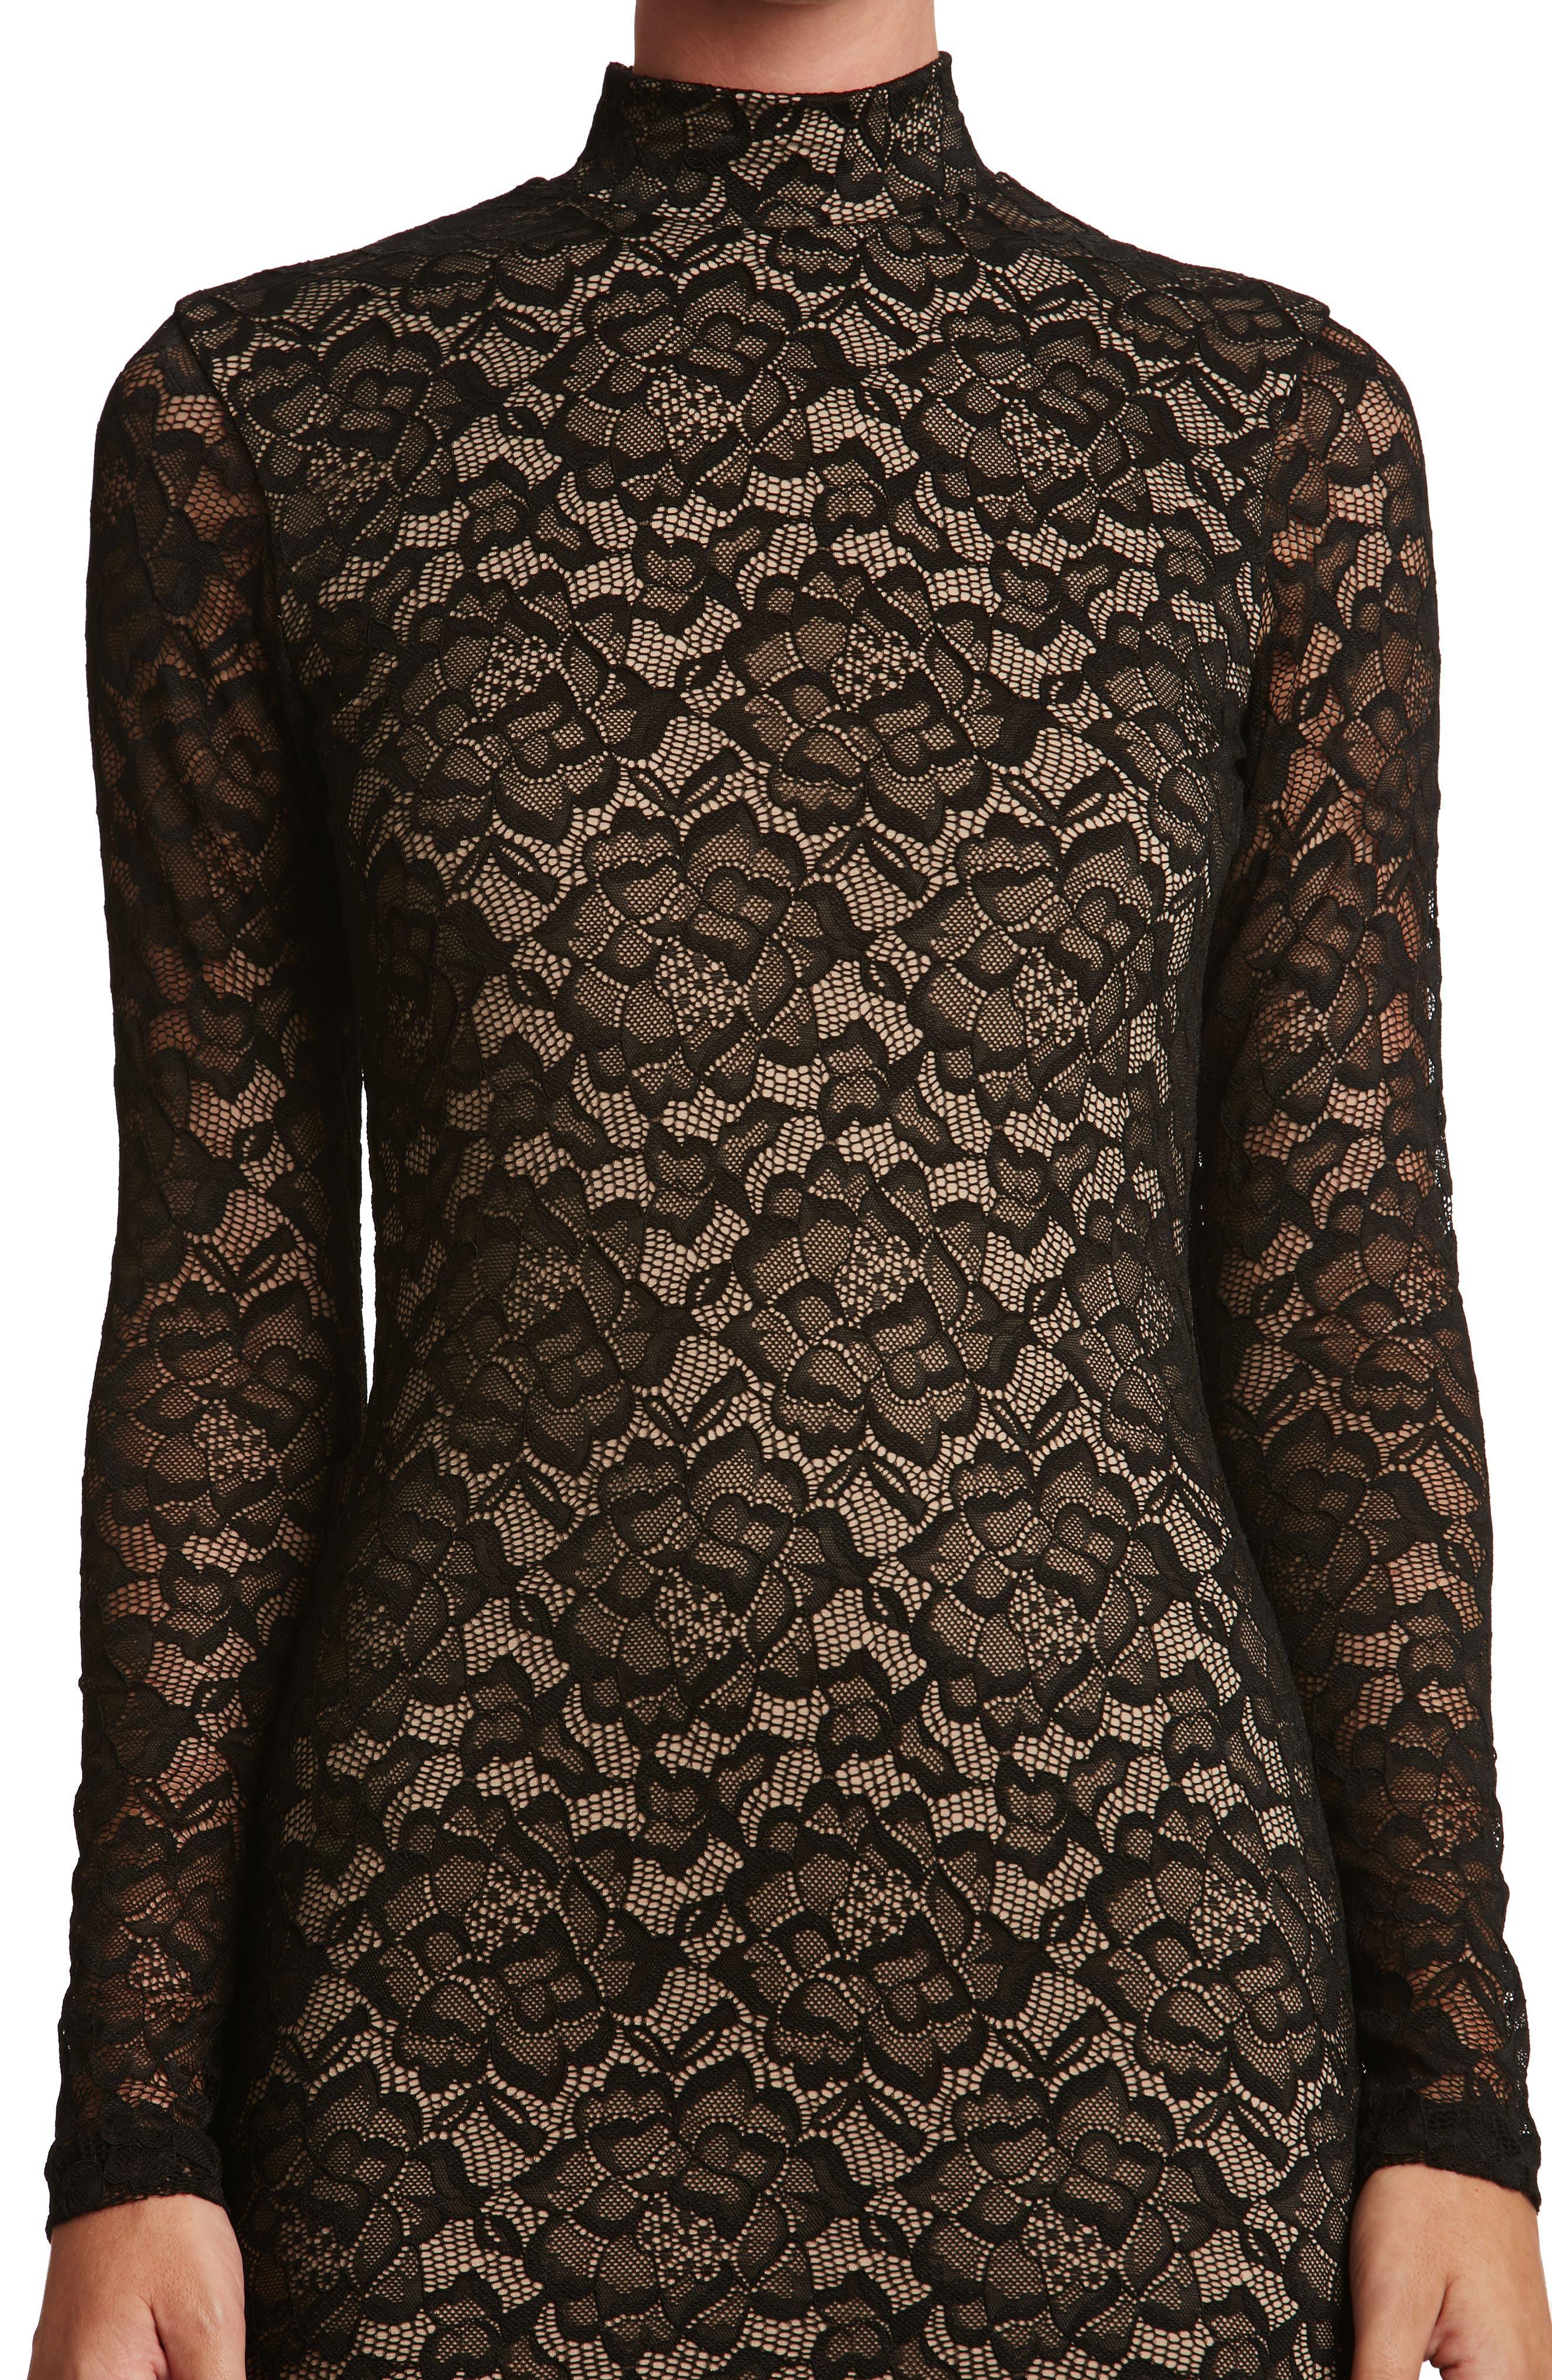 Penelope Body-Con Dress,                             Alternate thumbnail 3, color,                             002